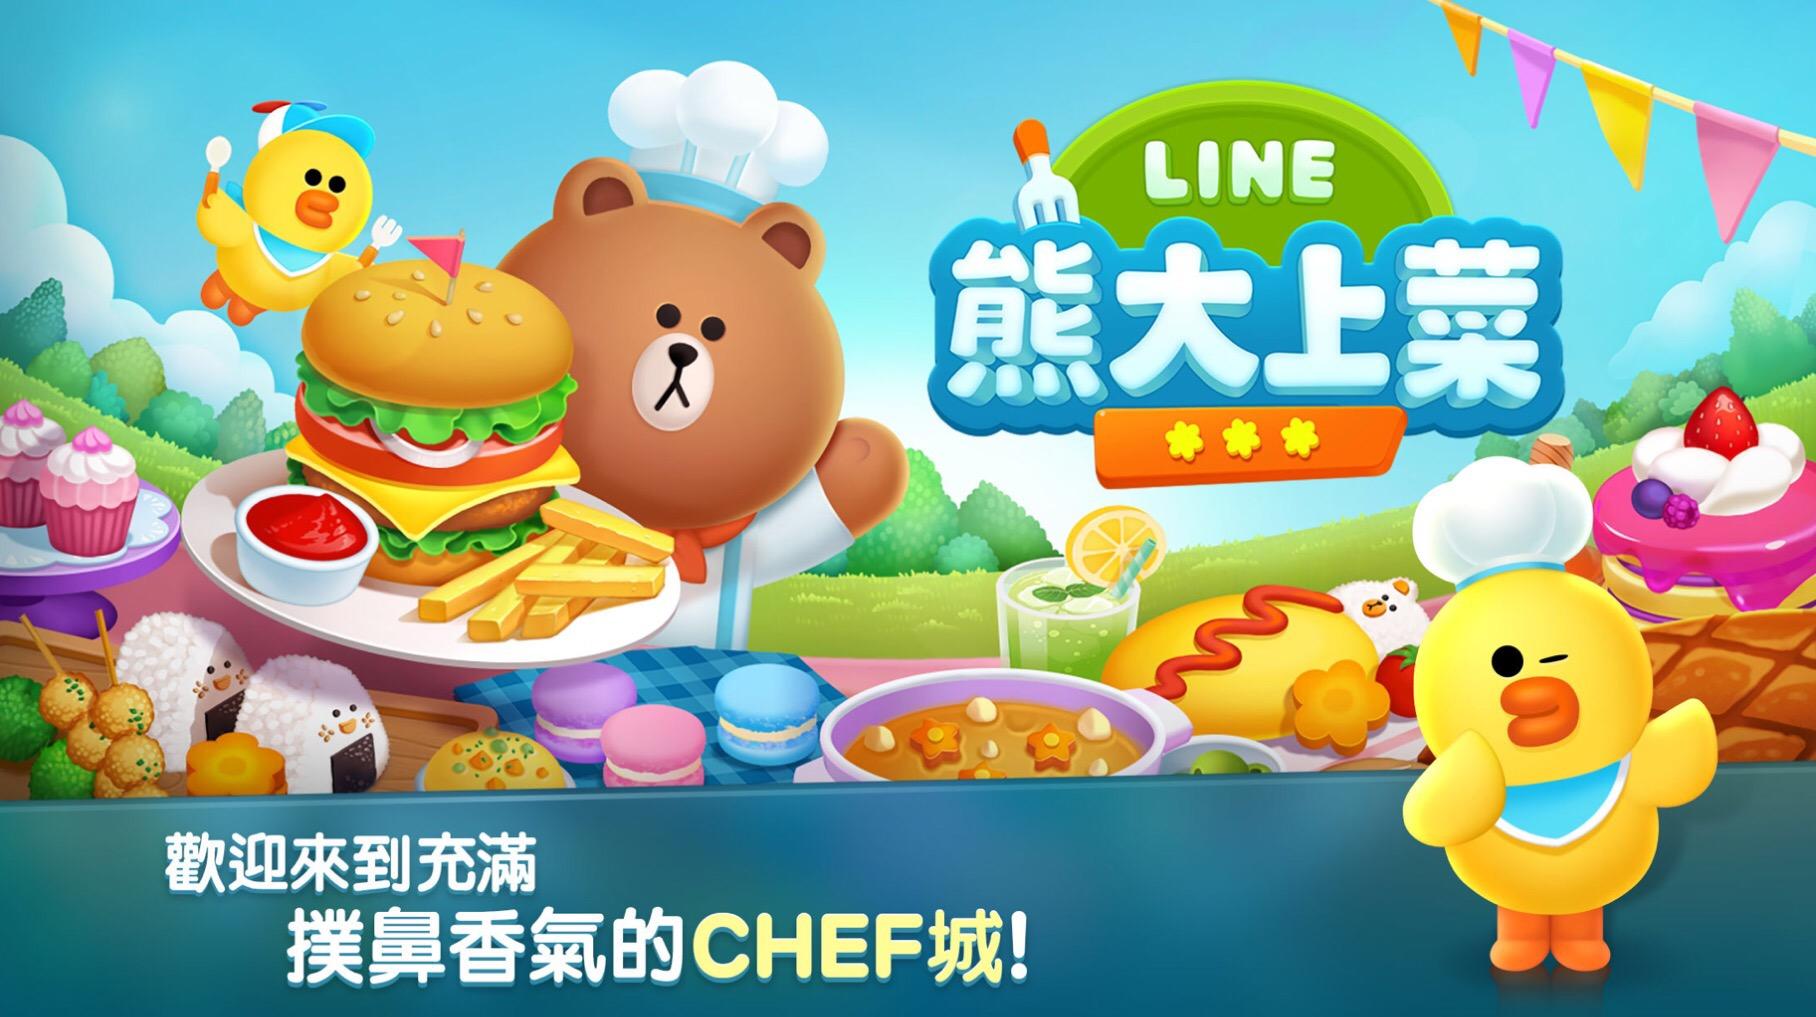 《LINE熊大上菜》超萌遊戲登場